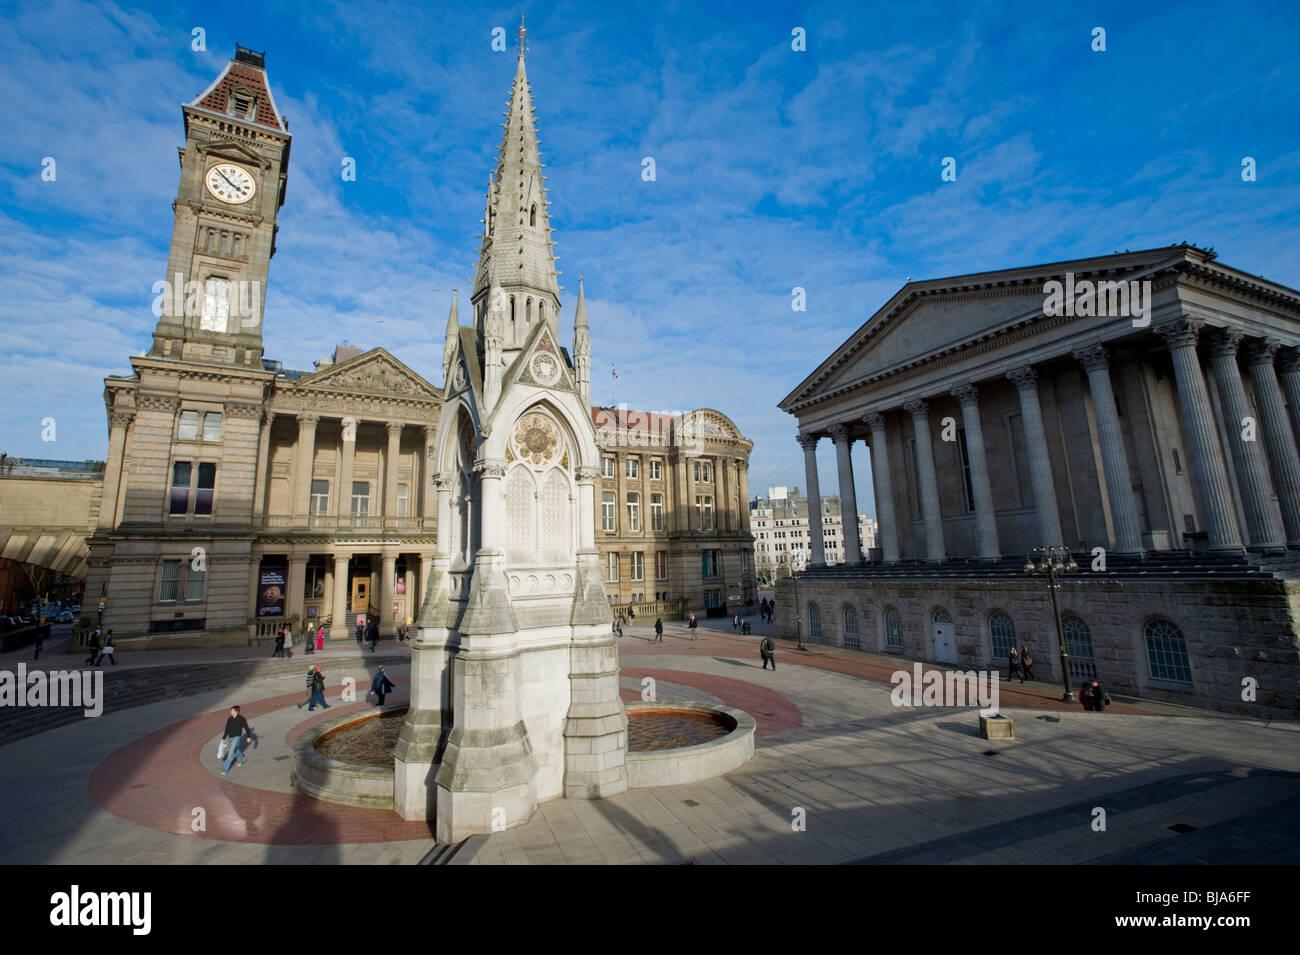 Chamberlain Square, Birmingham, Angleterre, Royaume-Uni. Montrant Le Chamberlain Memorial Fountain, le Birmingham Banque D'Images